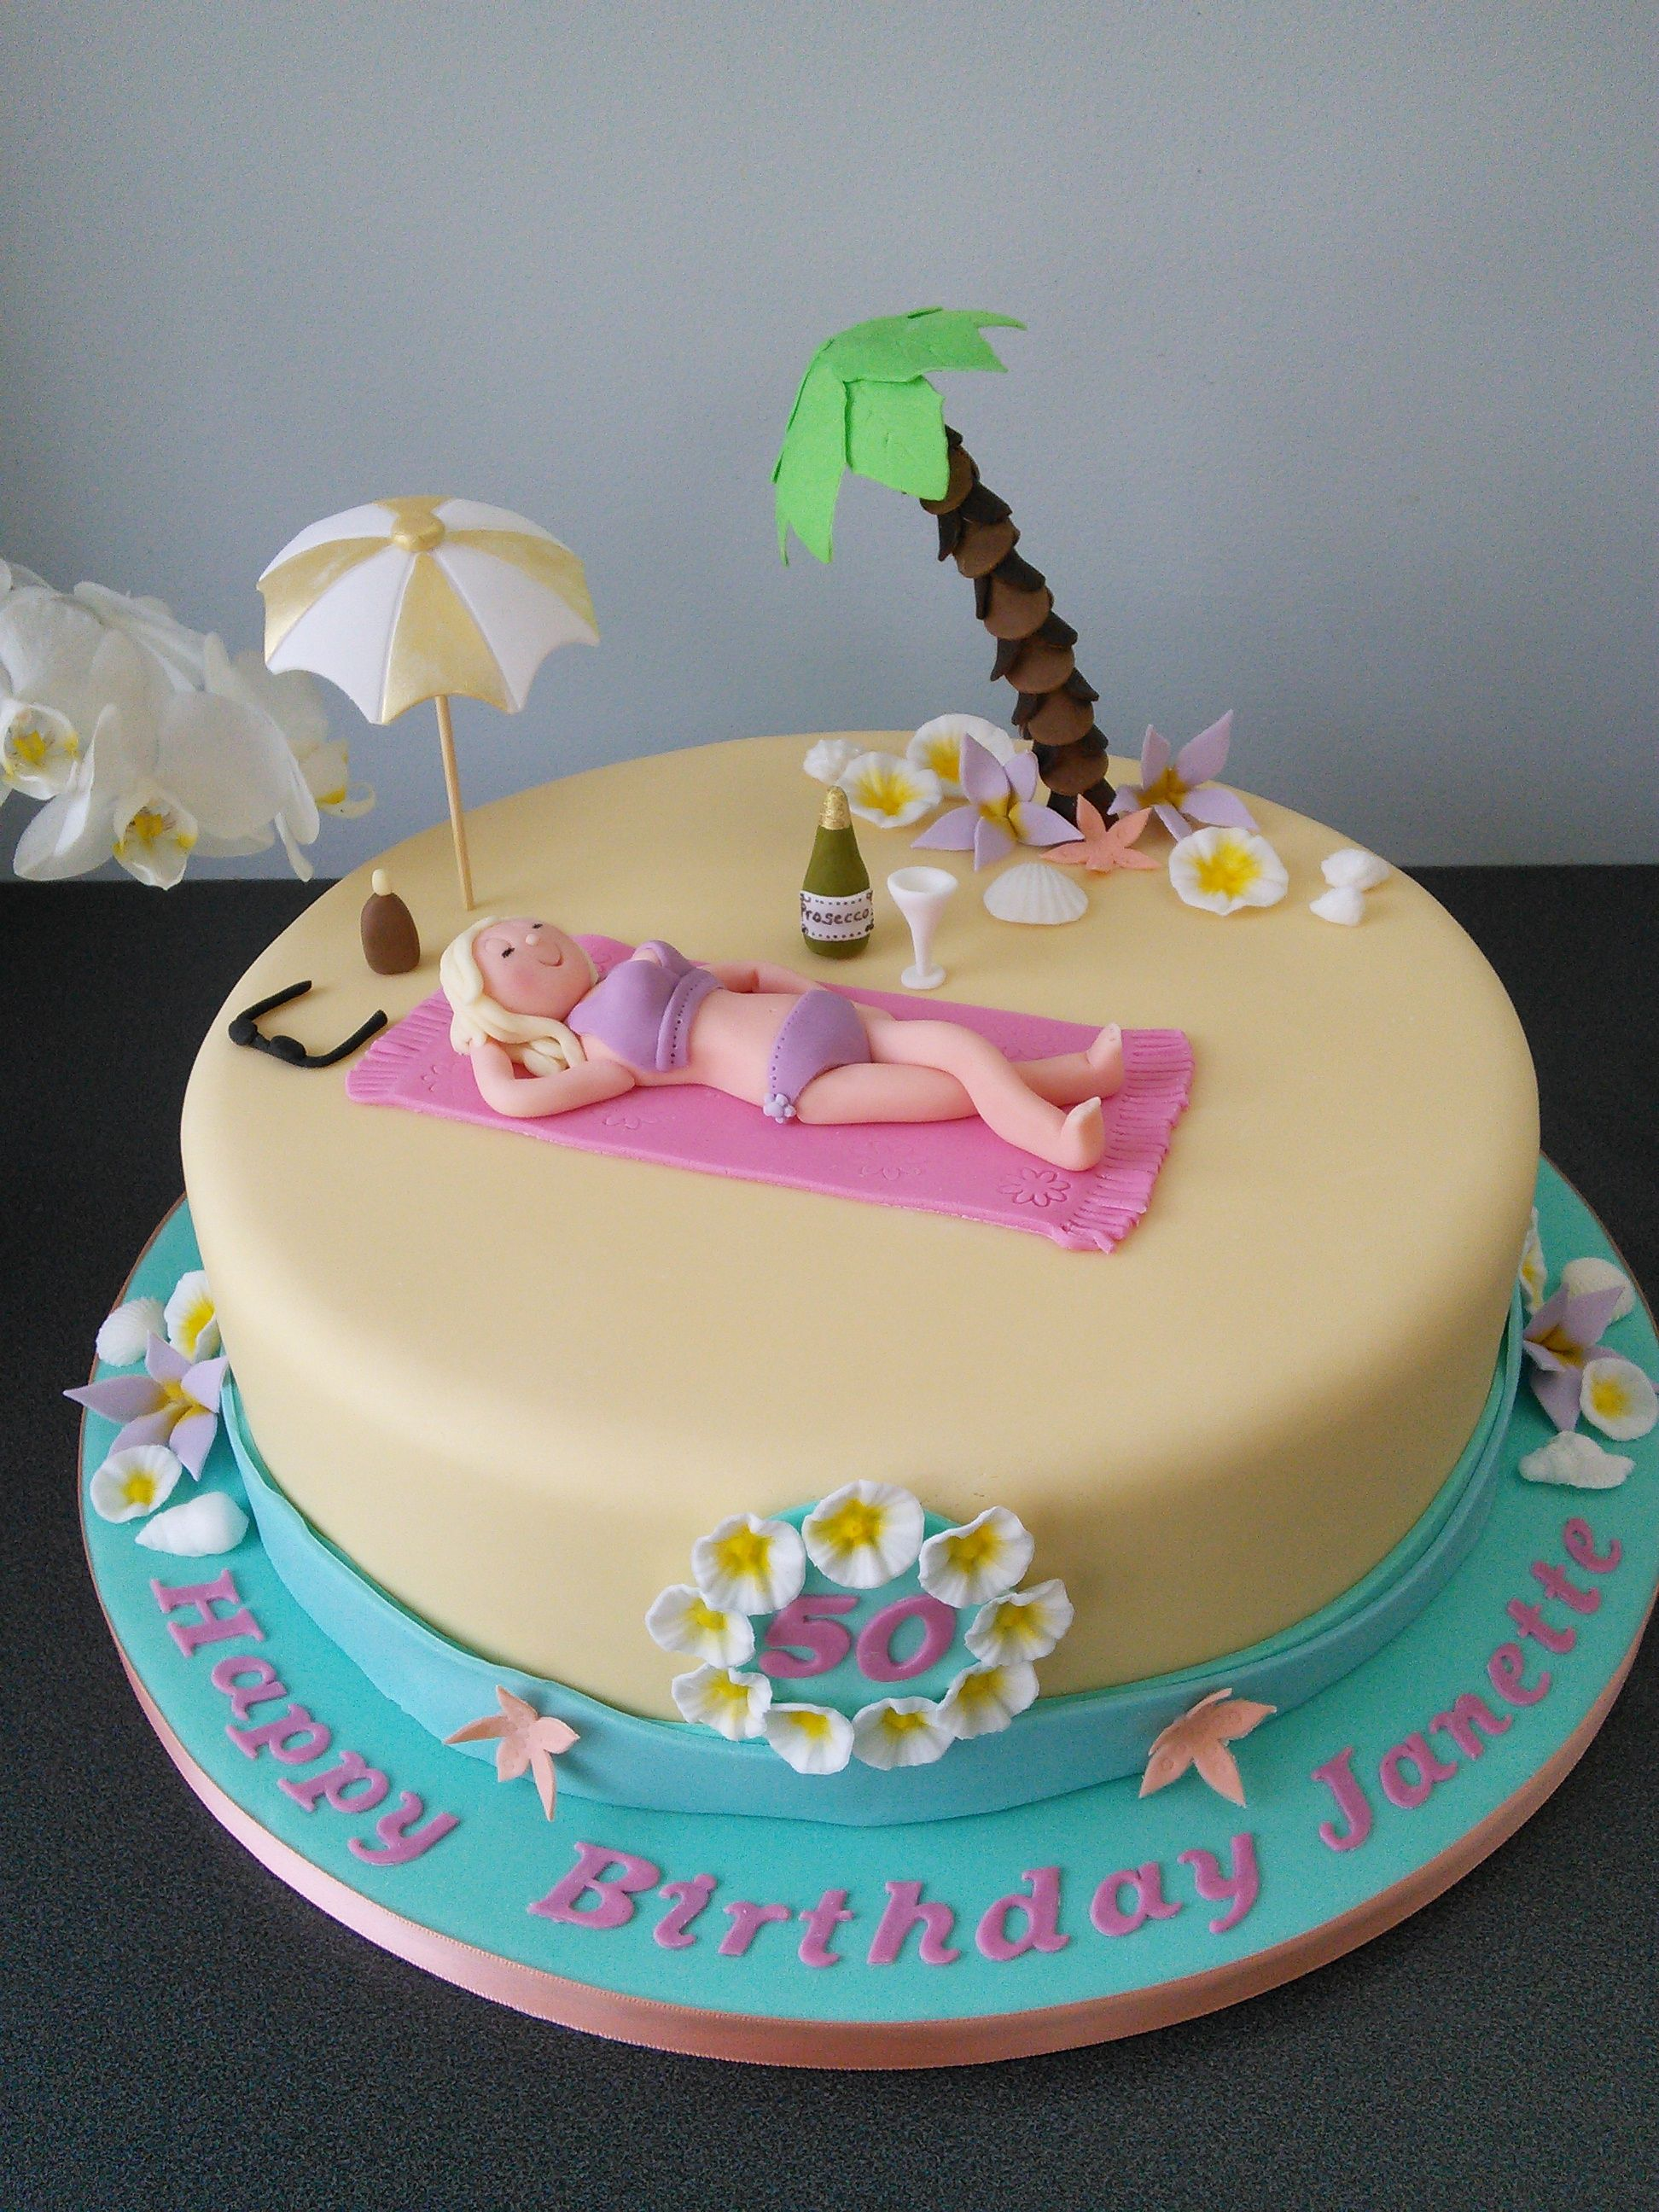 Beach cake for 50th birthday, sunbathing, umbrella, palm tree